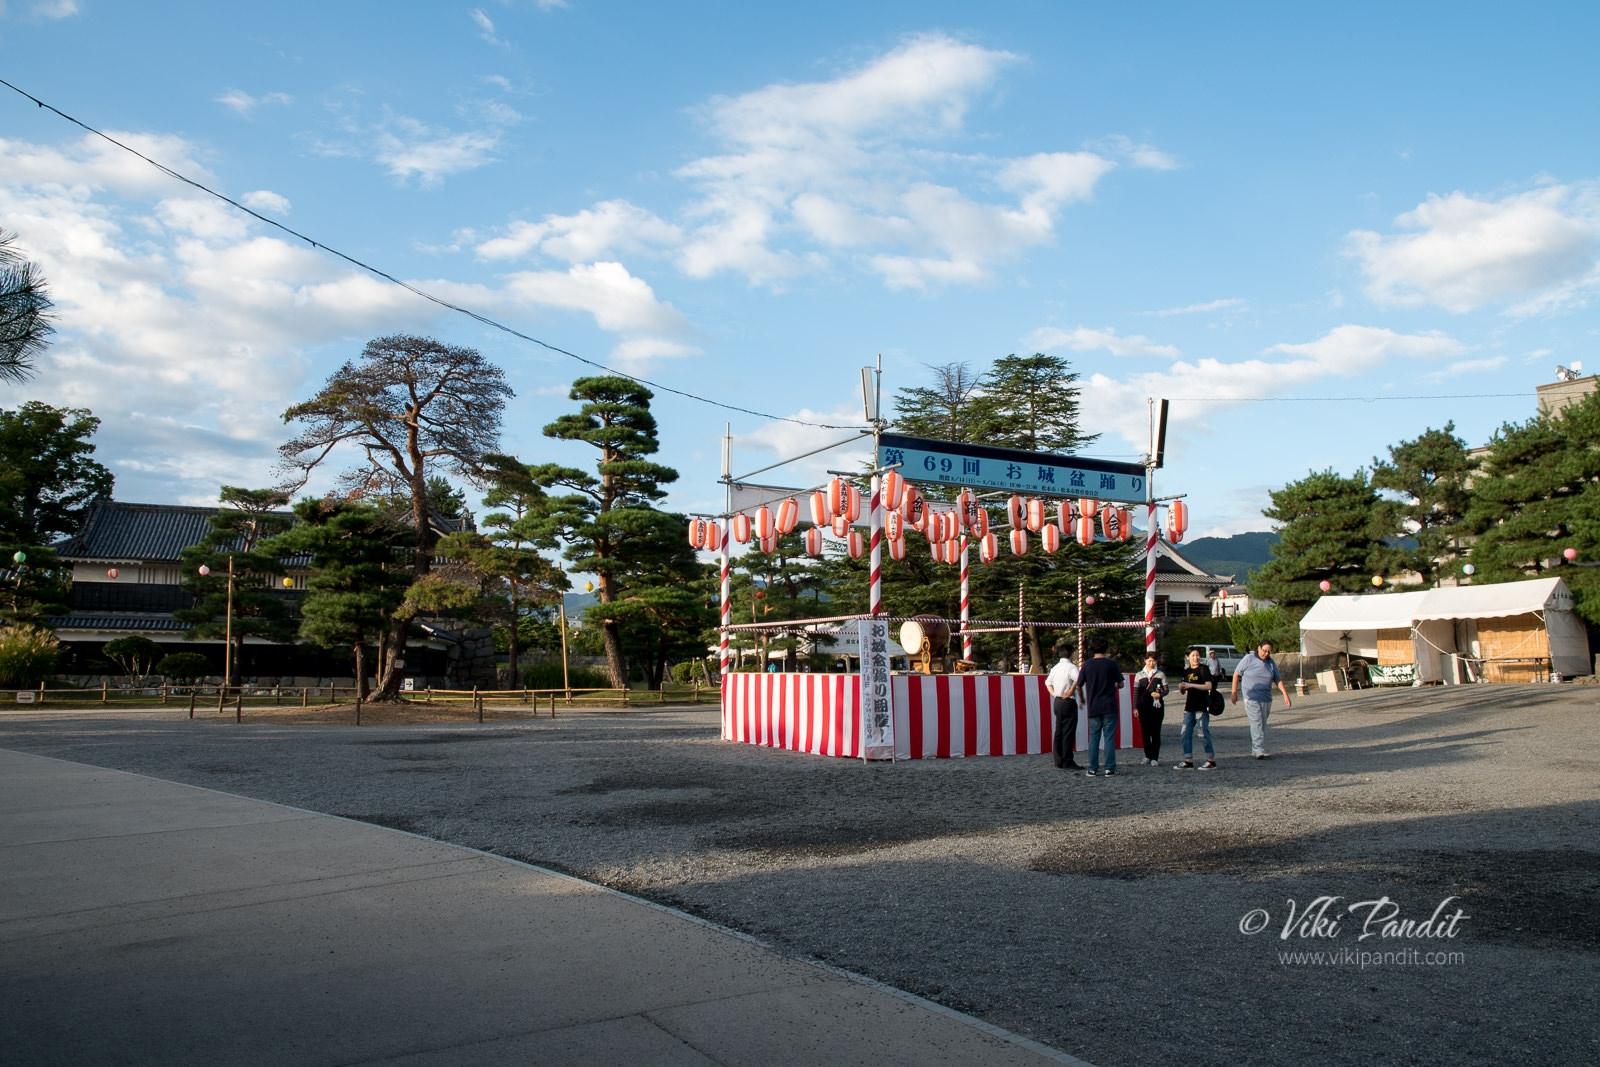 Taiko Drum Festival in Matsumoto